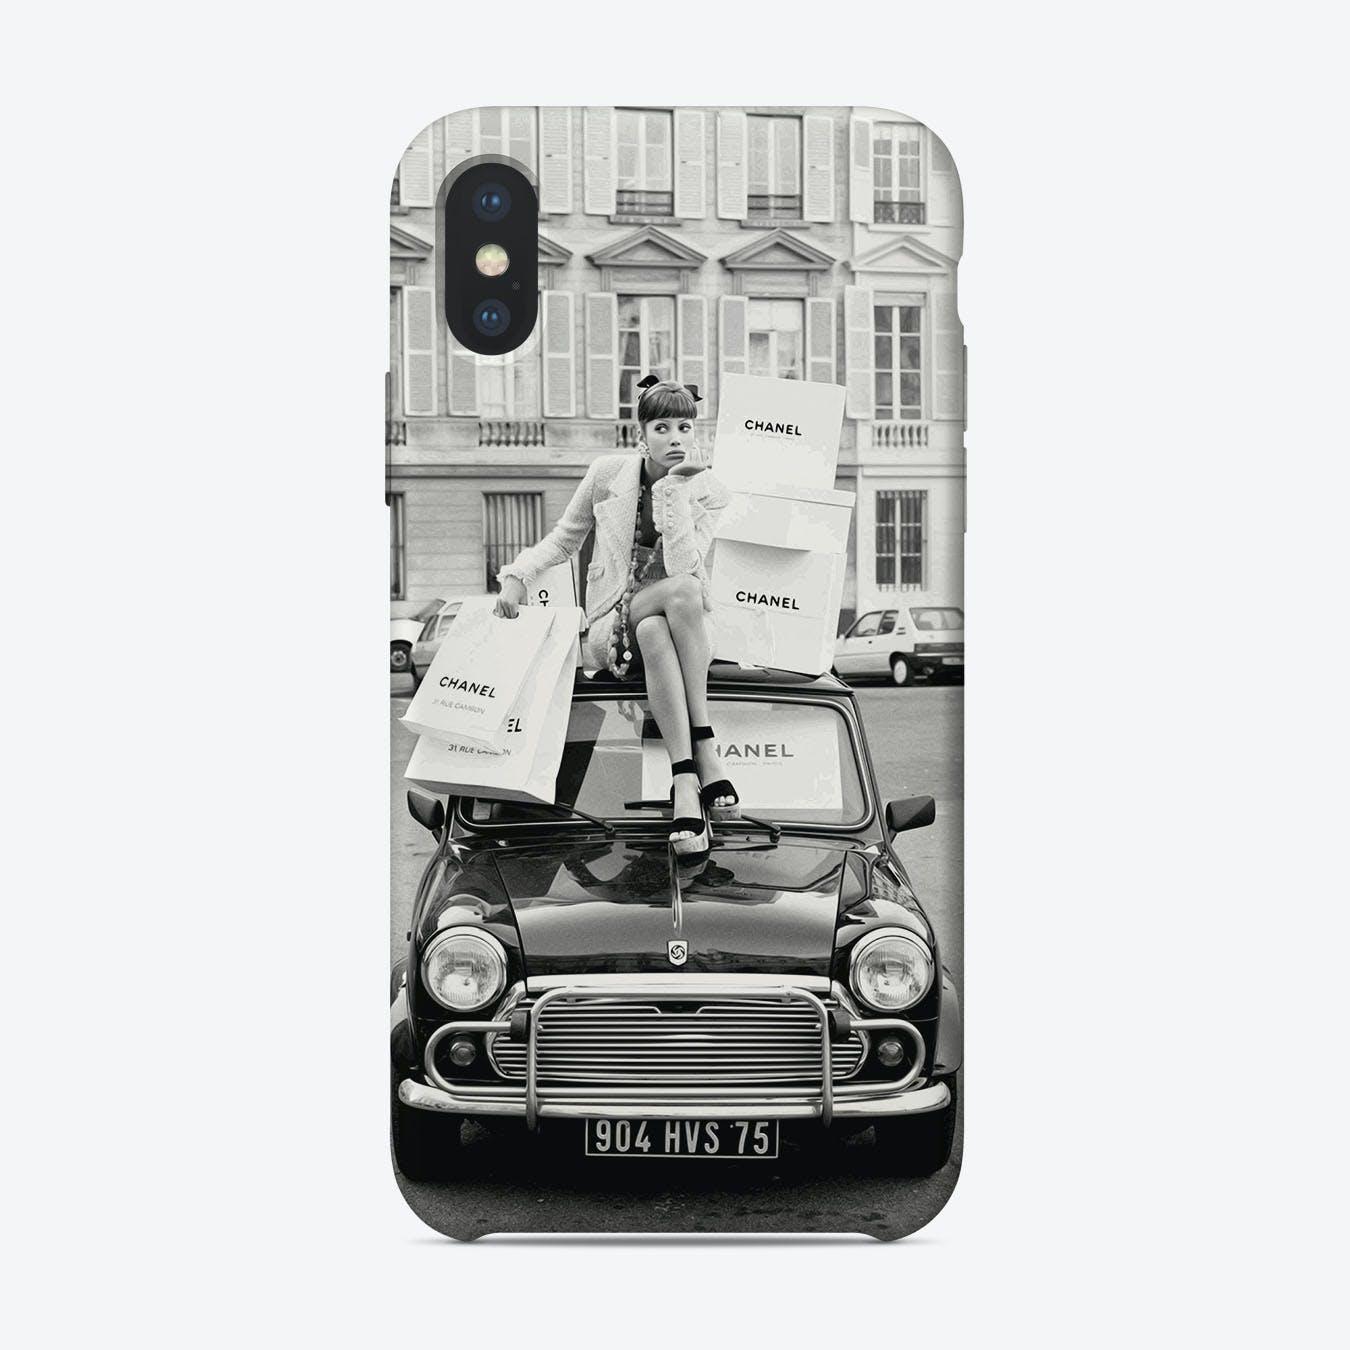 Chanel Mini iPhone Case